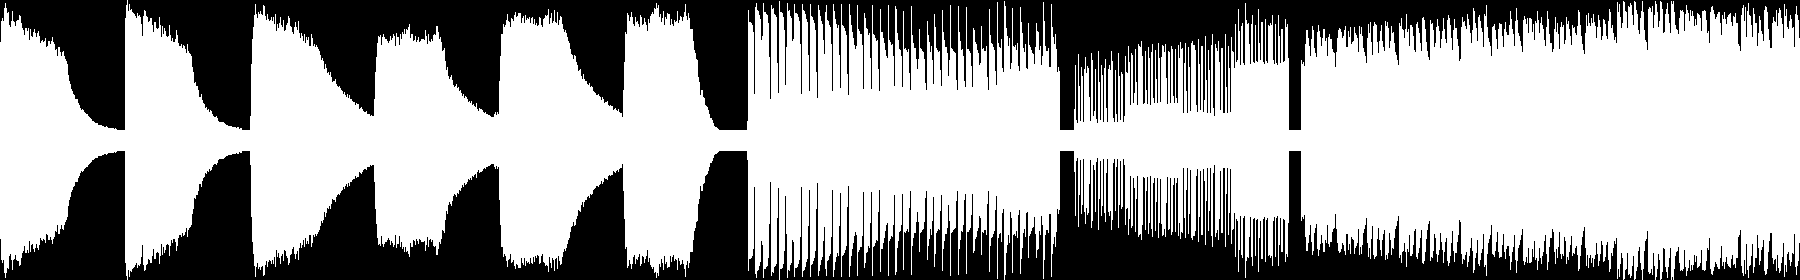 Infinite Color (RC 20 Presets) audio waveform